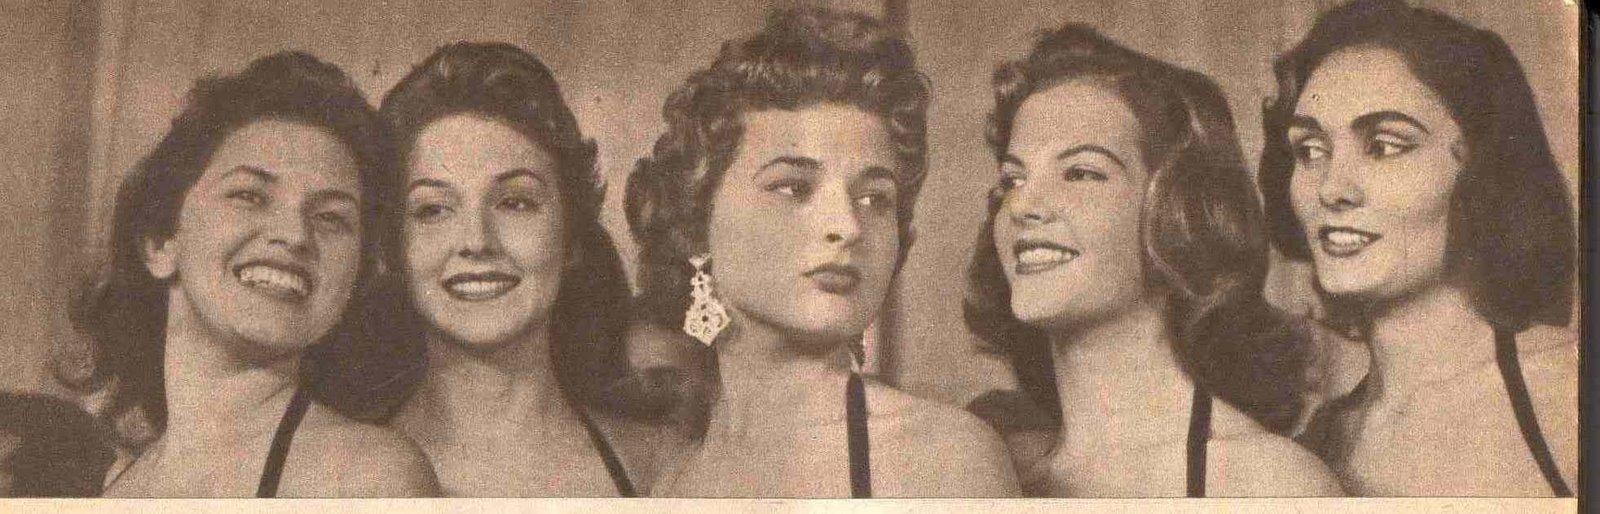 ingrid schmidt grael, miss rio de janeiro 1955 (1938-2008). † Ingrid13